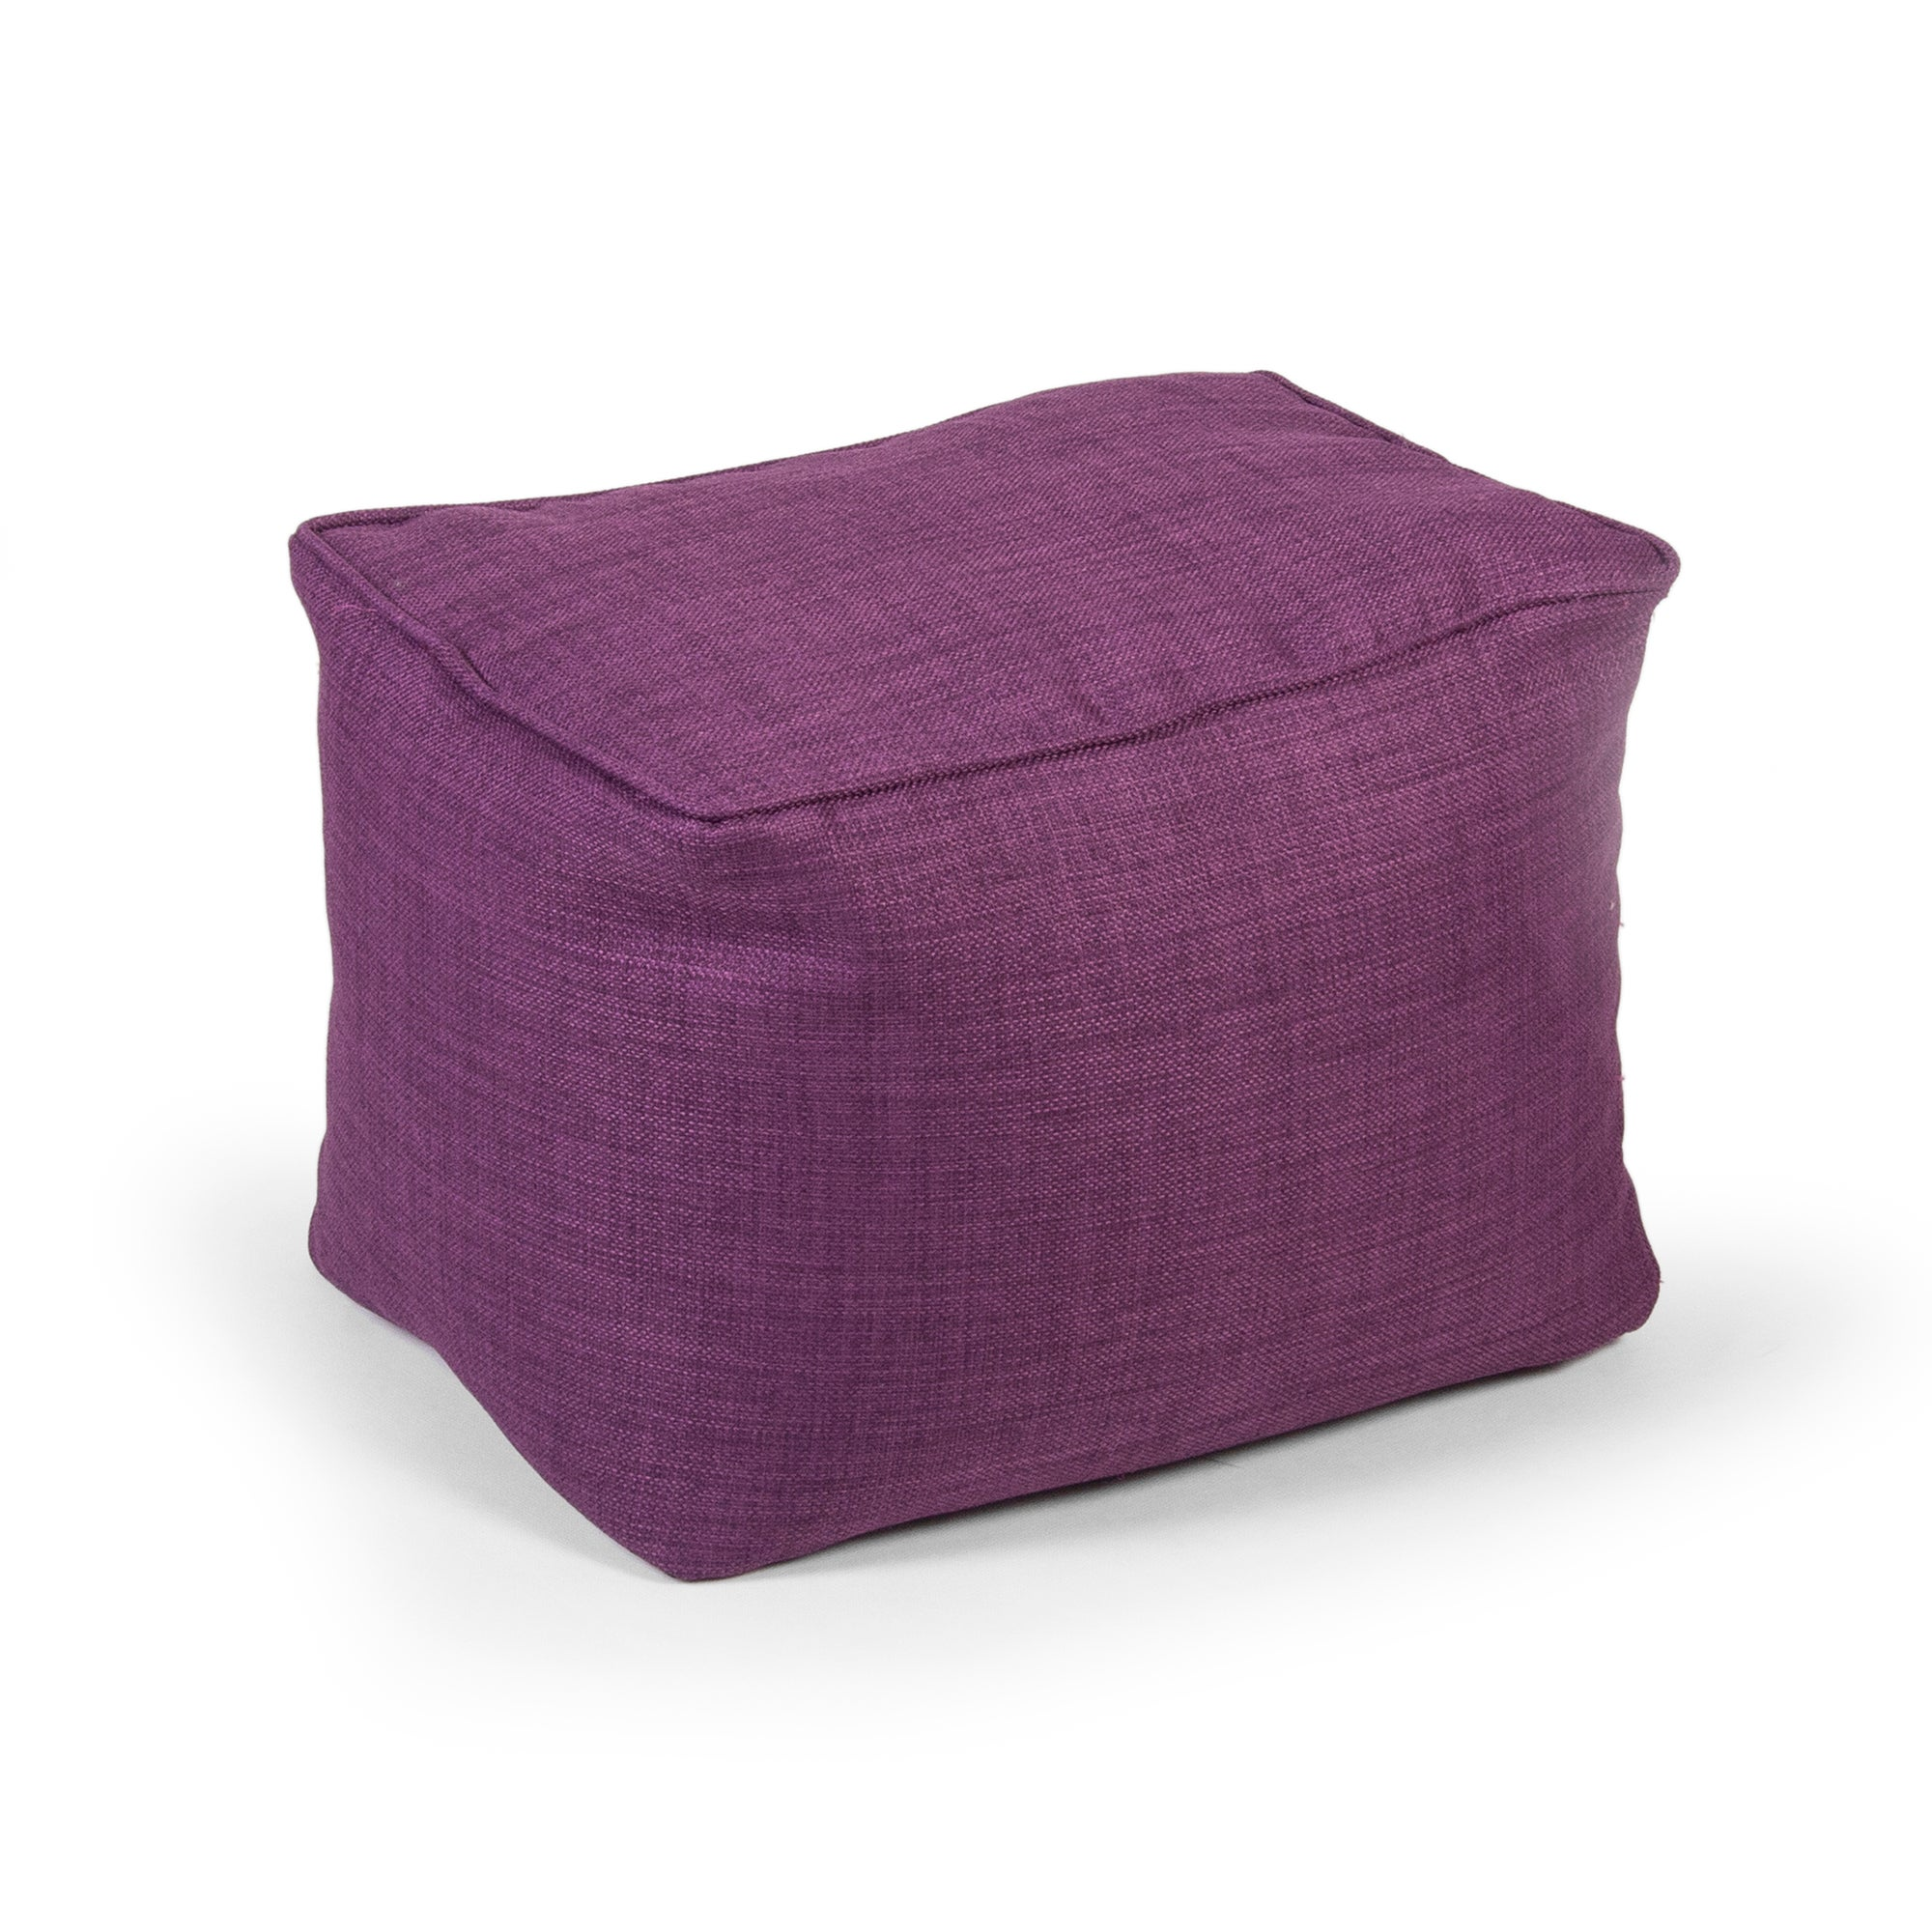 Linoso Sicily Cube